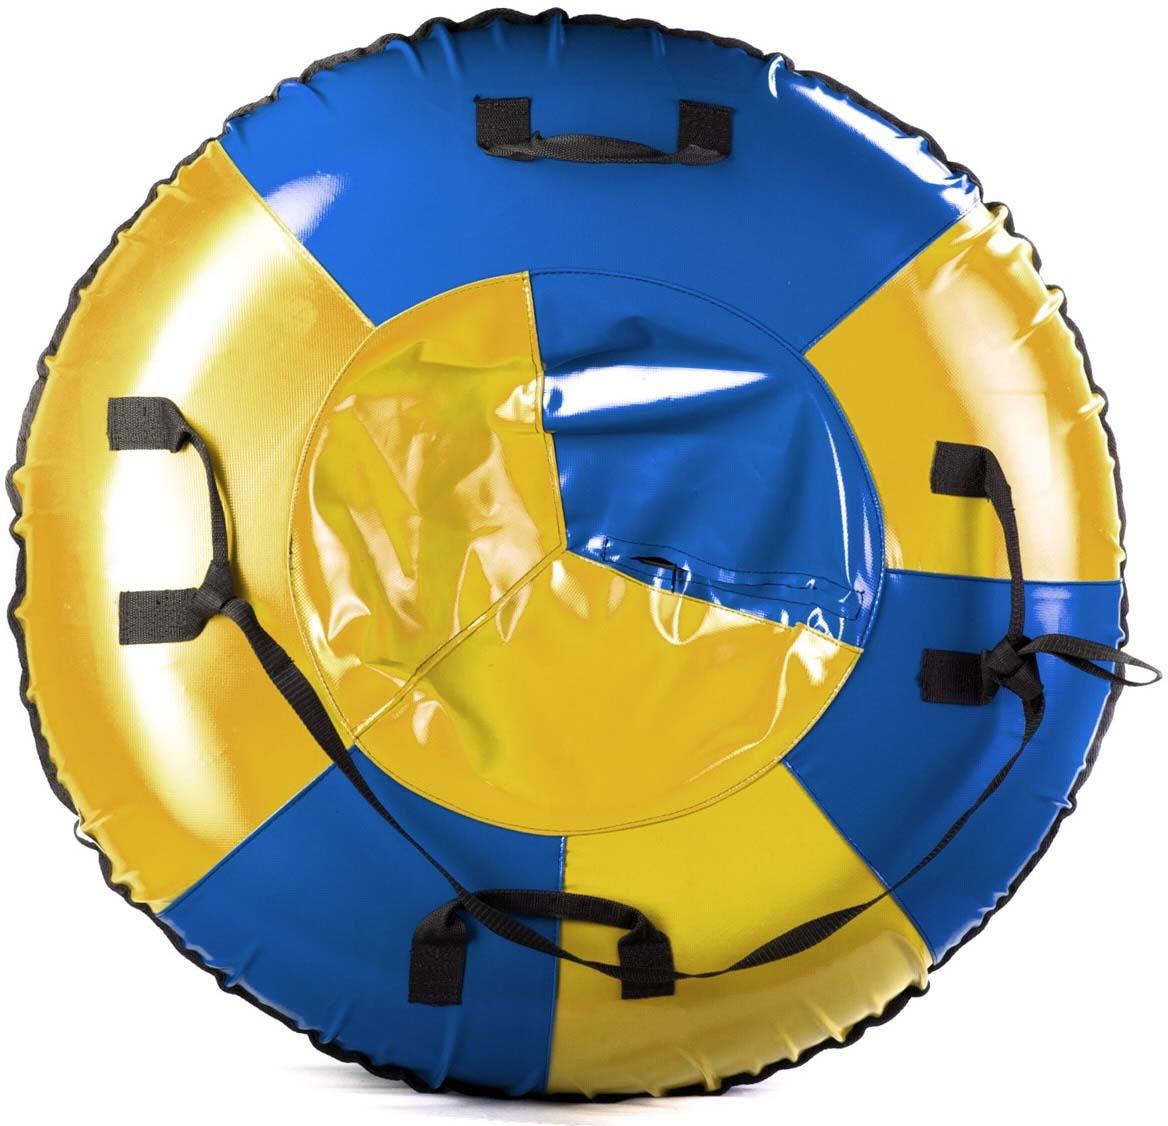 Тюбинг Indigo Мега, SM-245-105, диаметр 105 см ватрушки метиз санки надувные ватрушка